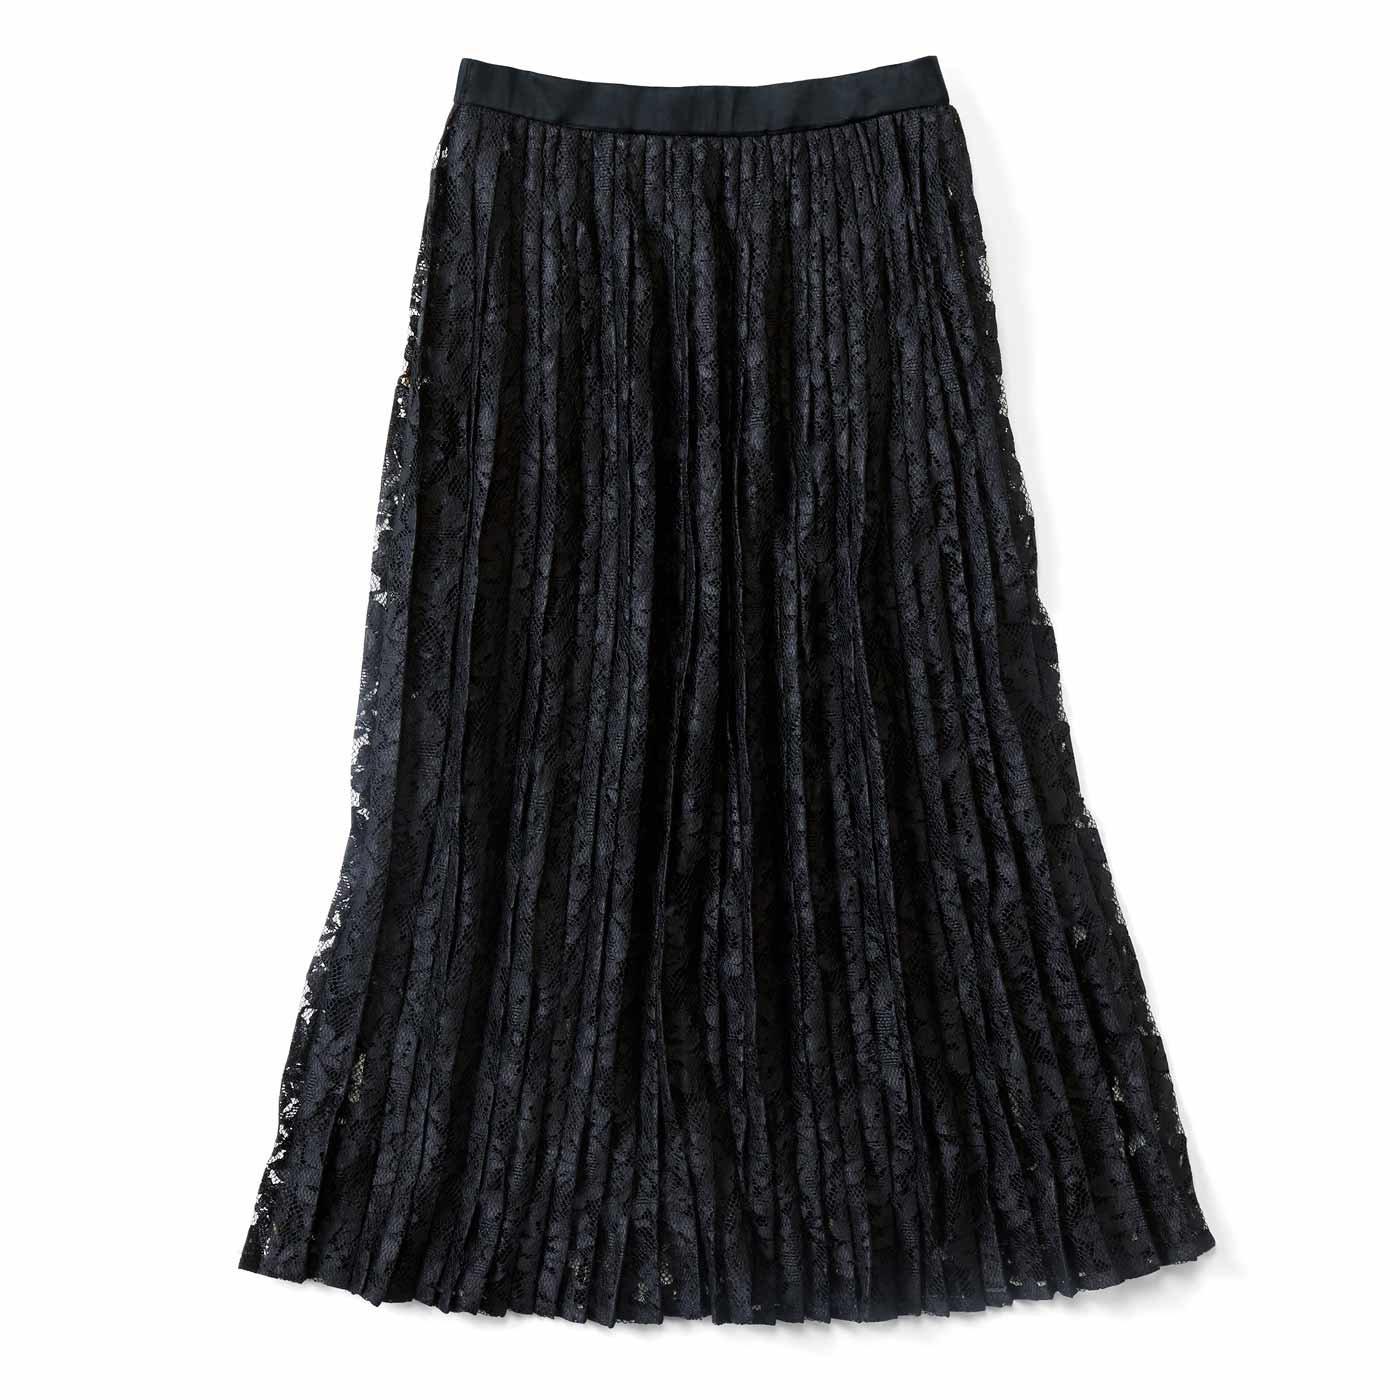 IEDIT[イディット] レースをぜいたくに使用した華やぎプリーツスカート〈ブラック〉